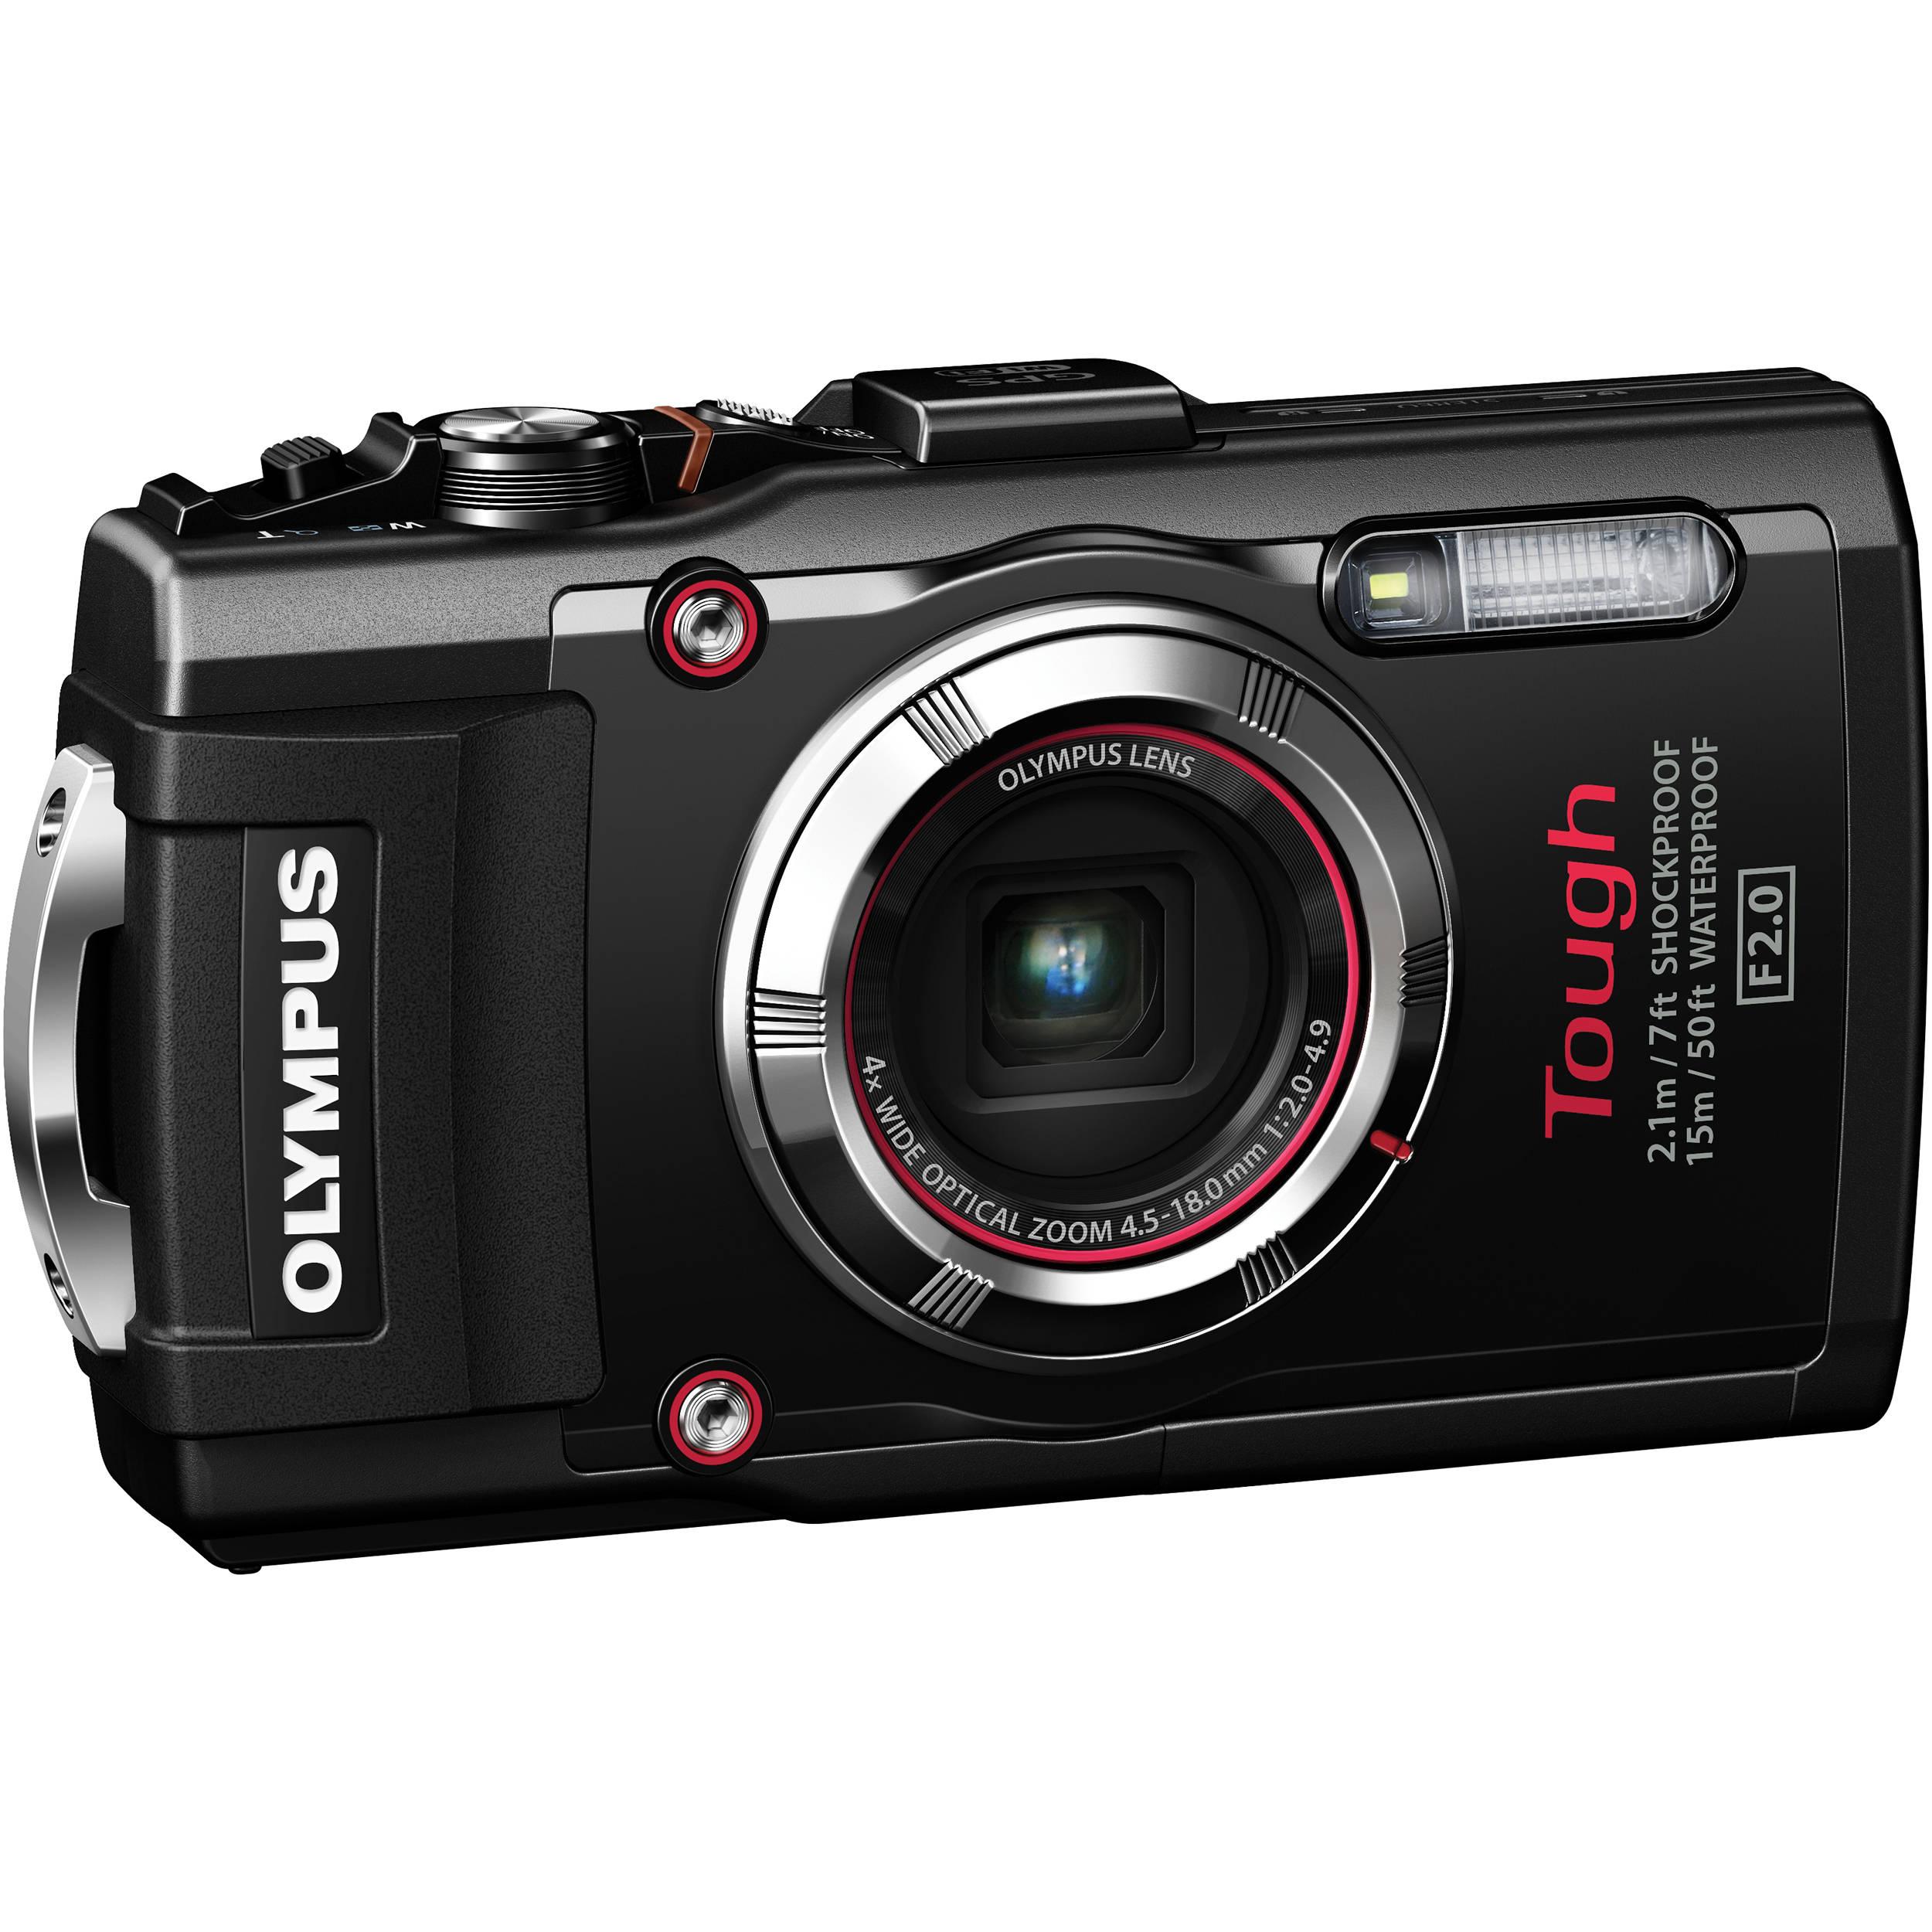 Photo Olympus Camera Olympus Stylus Tough Tg-3